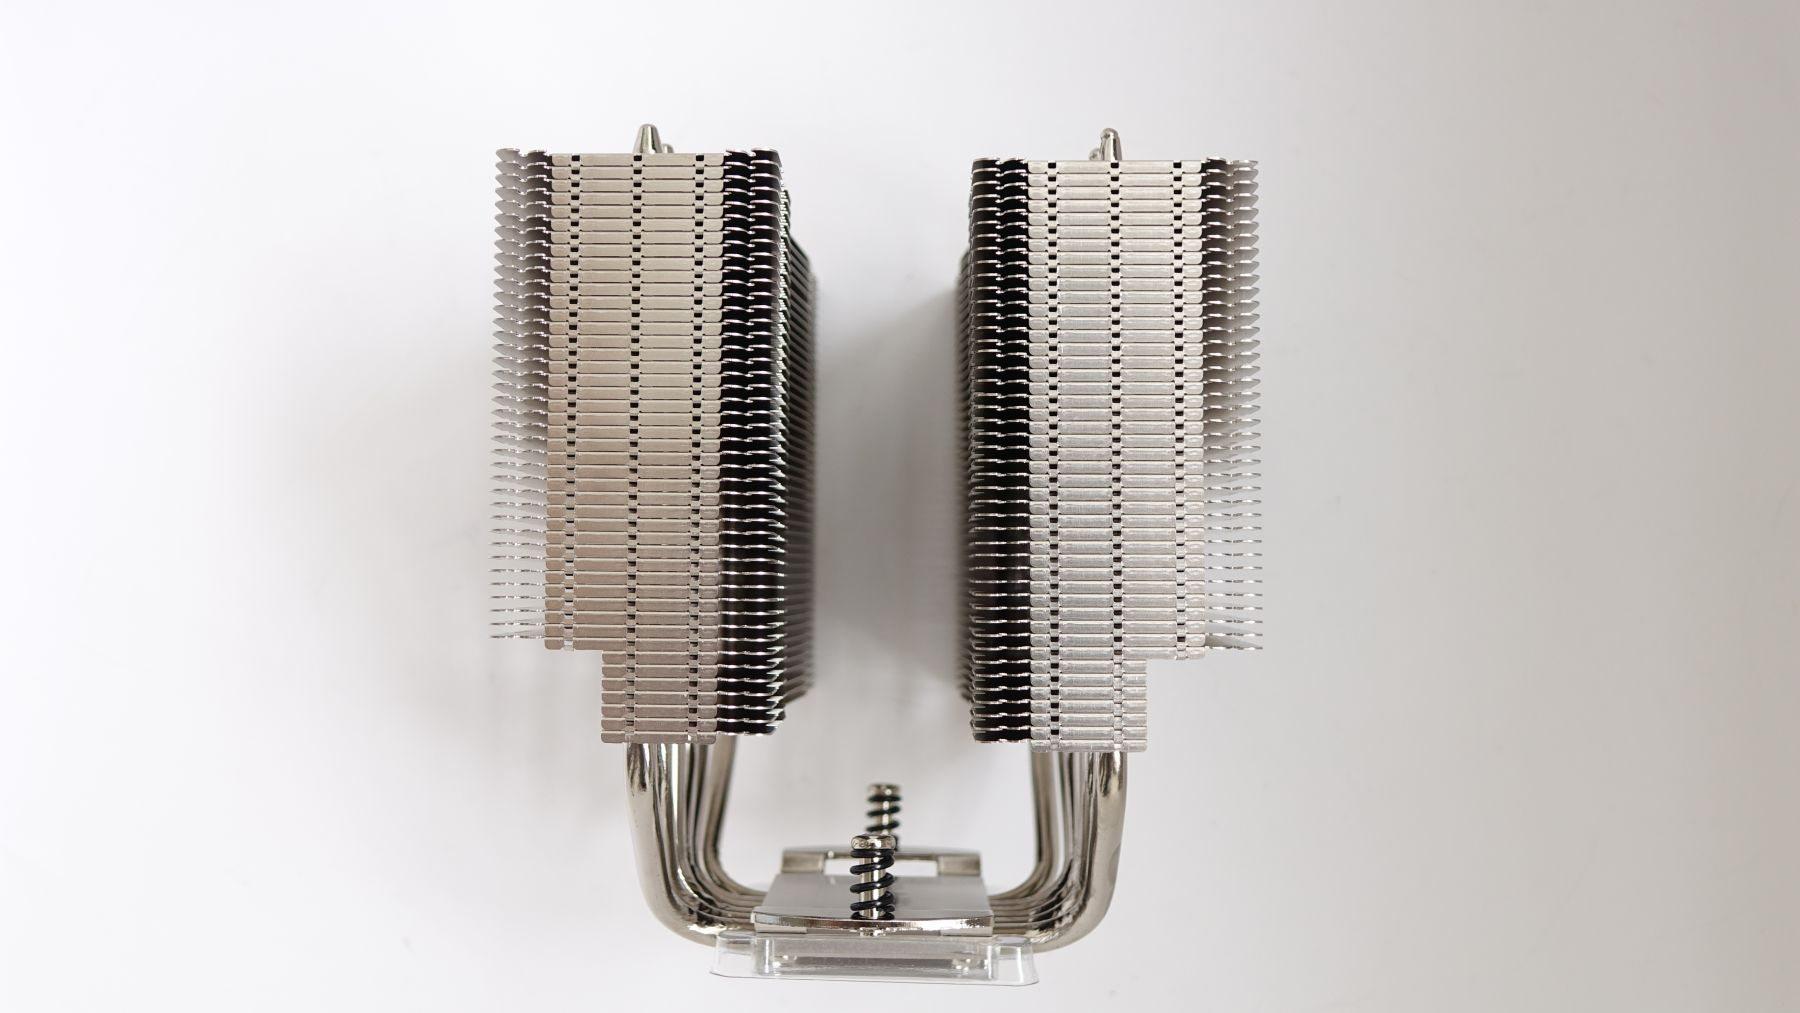 Noctua NH-D15S радиатор